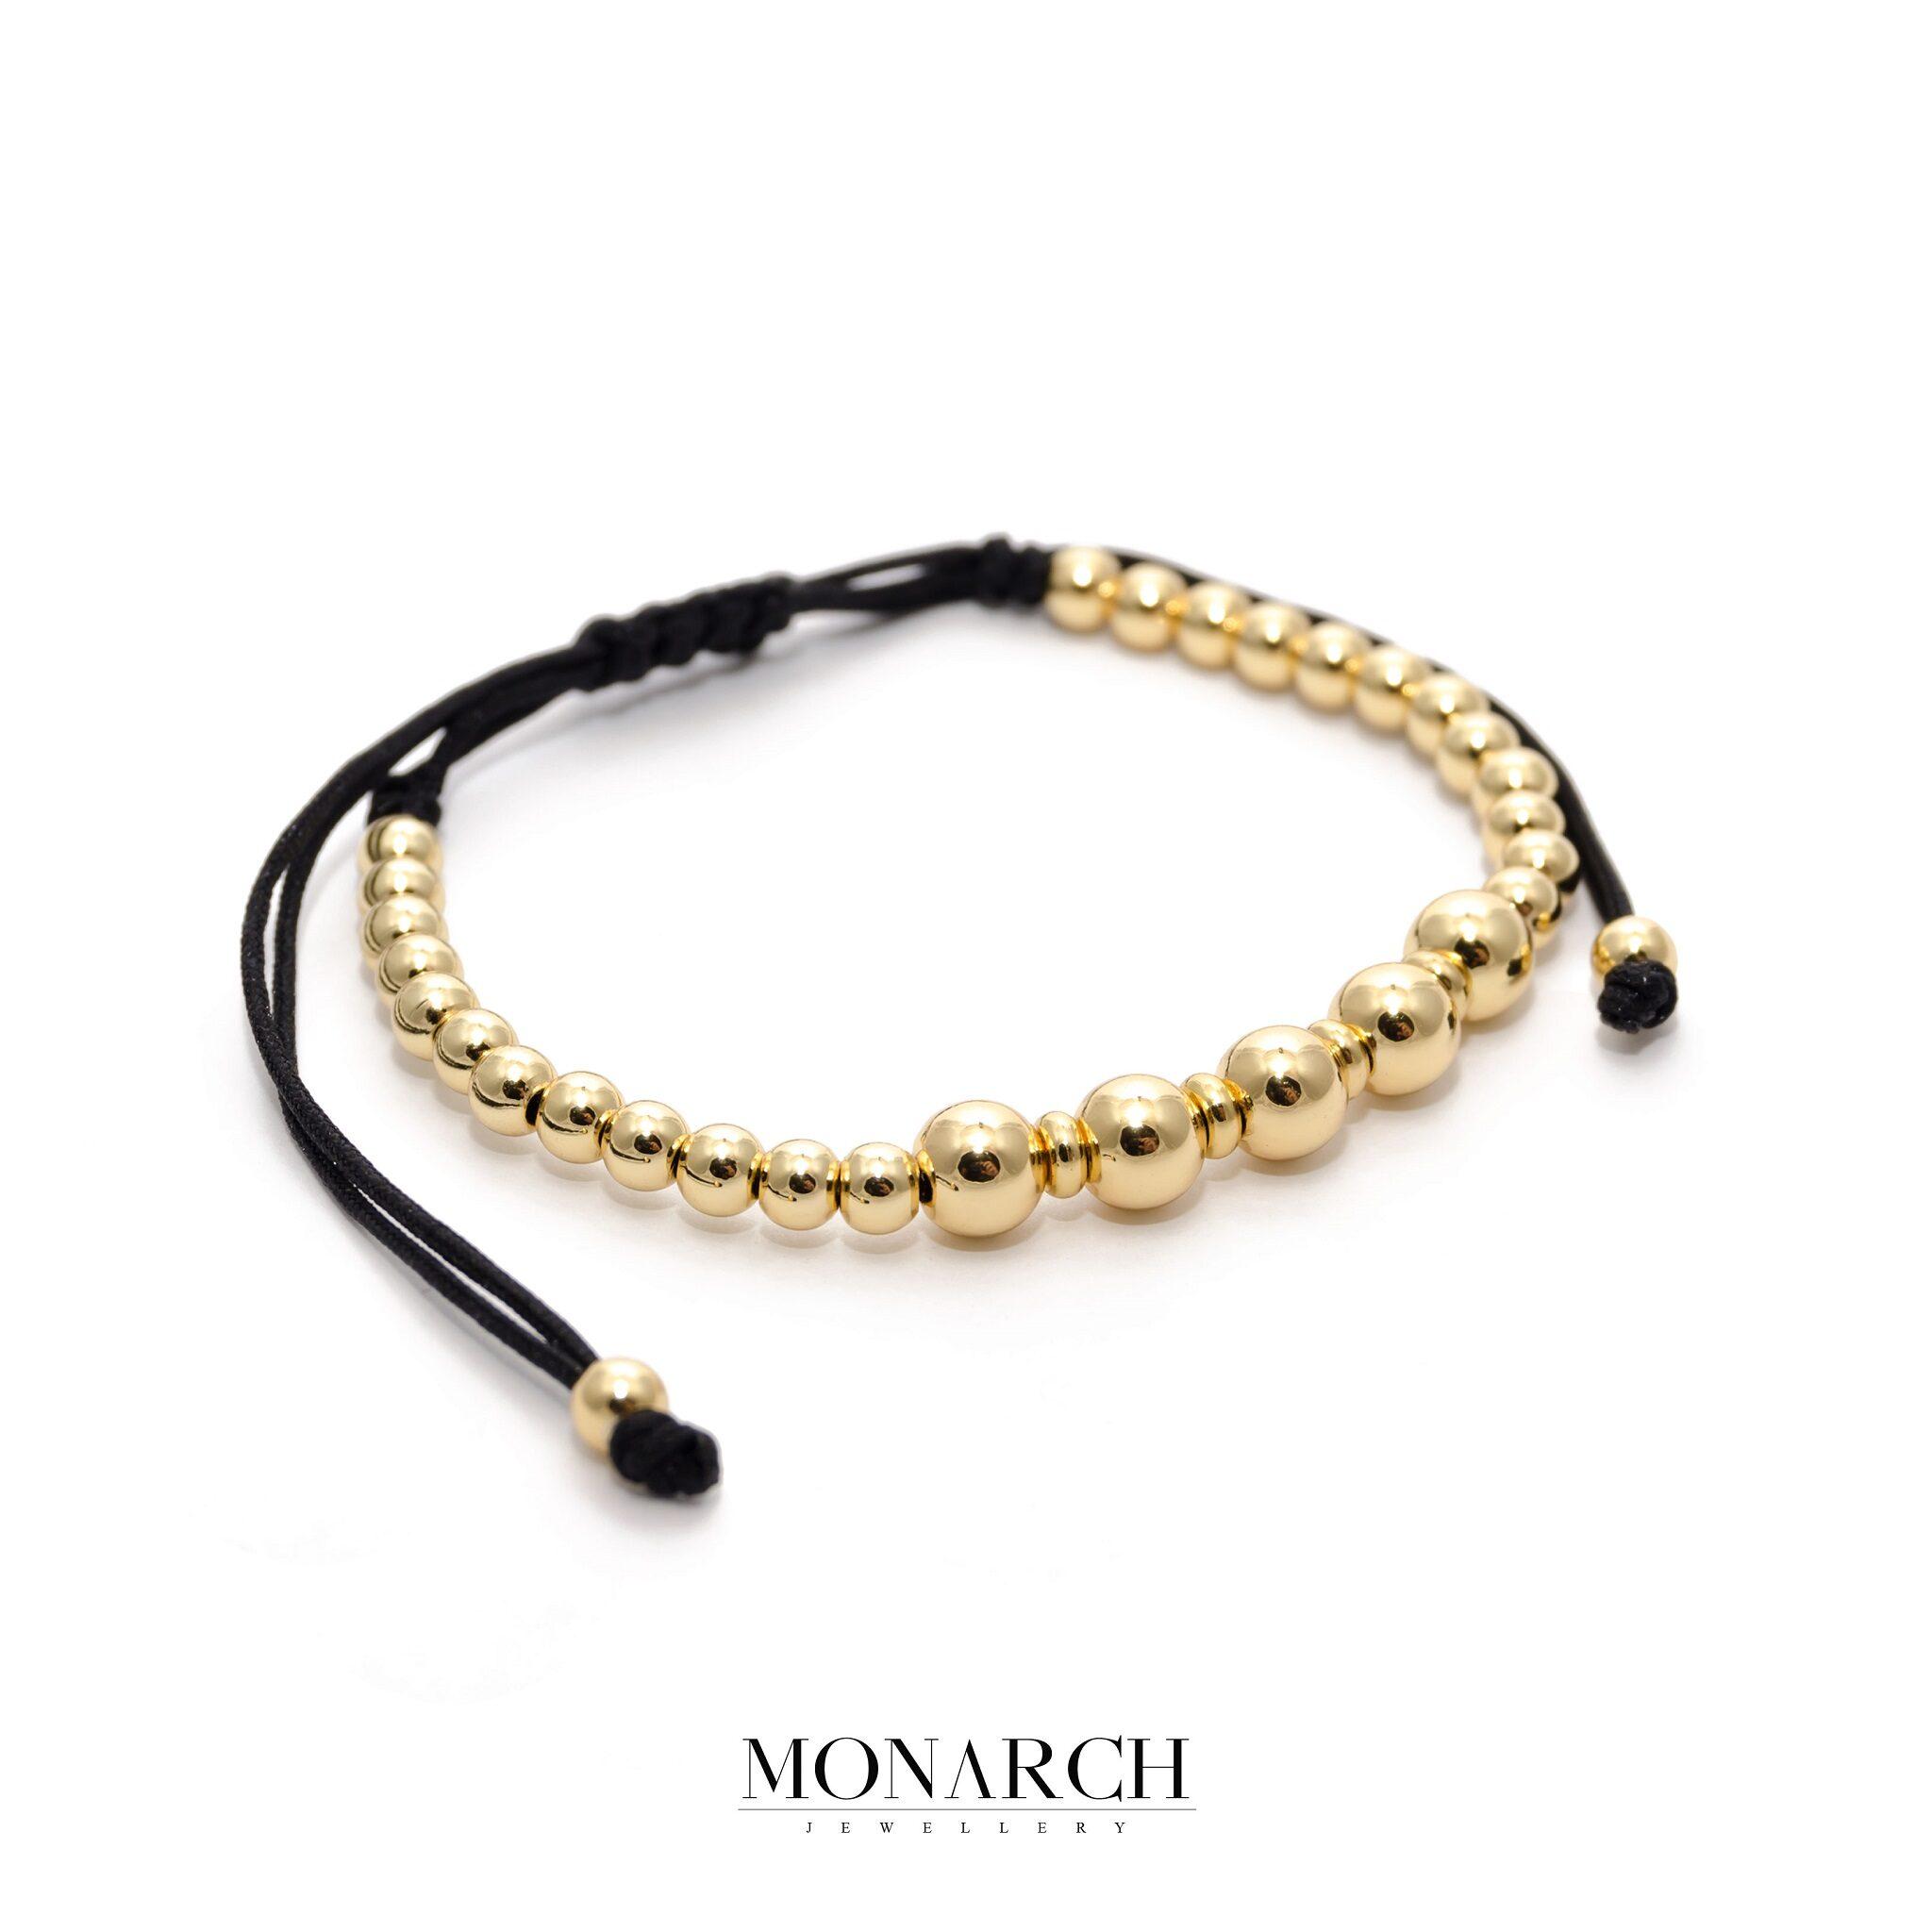 24K Gold Penta Macrame Bracelet